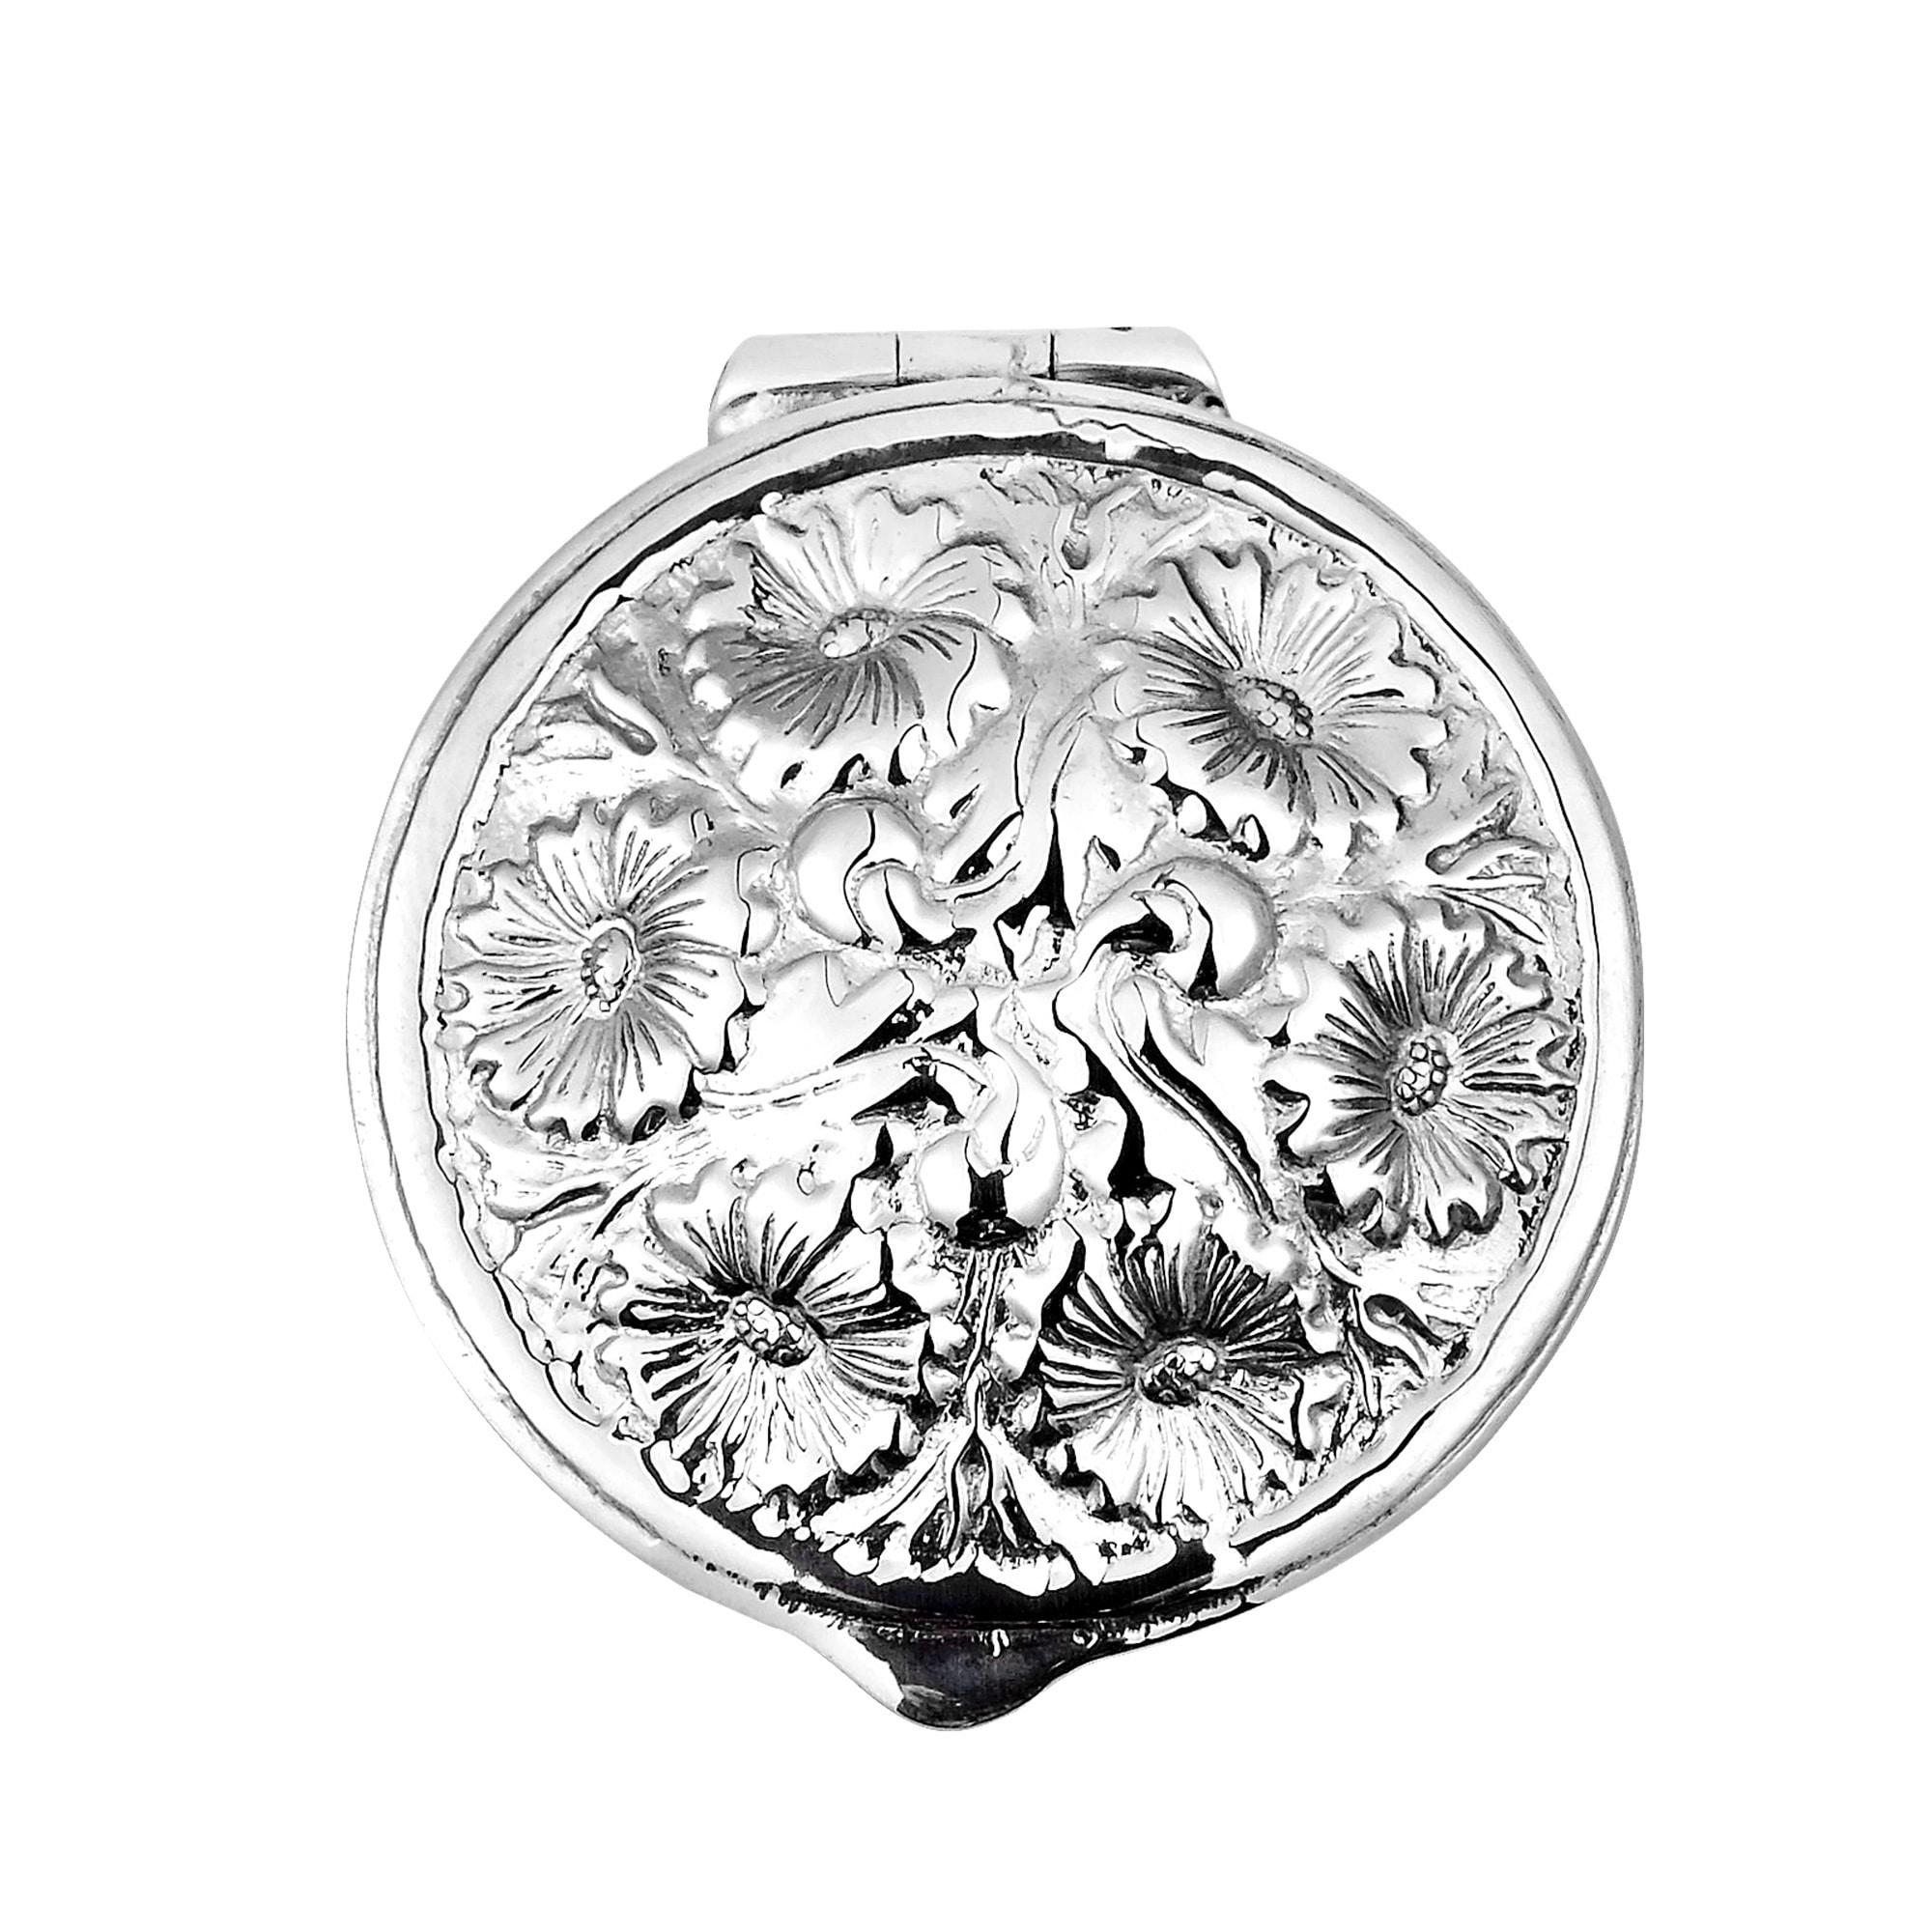 Aeravida Handmade Embossed Victorian Floral .925 Silver Gift Box Keepsake (Thailand) (Silver) (Metal)